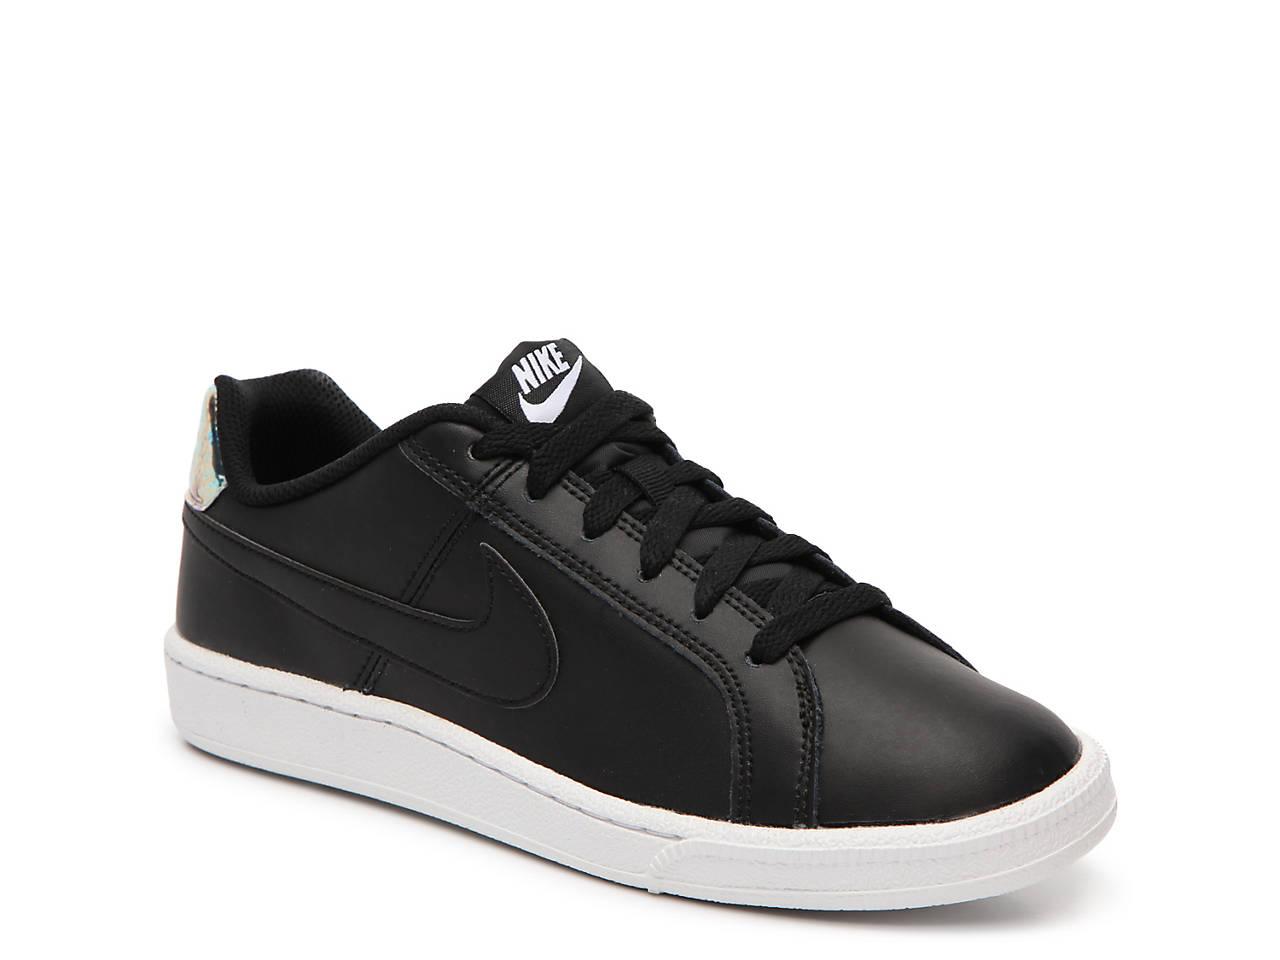 4f27714dc4de16 Nike Court Royale Sneaker - Women s Women s Shoes